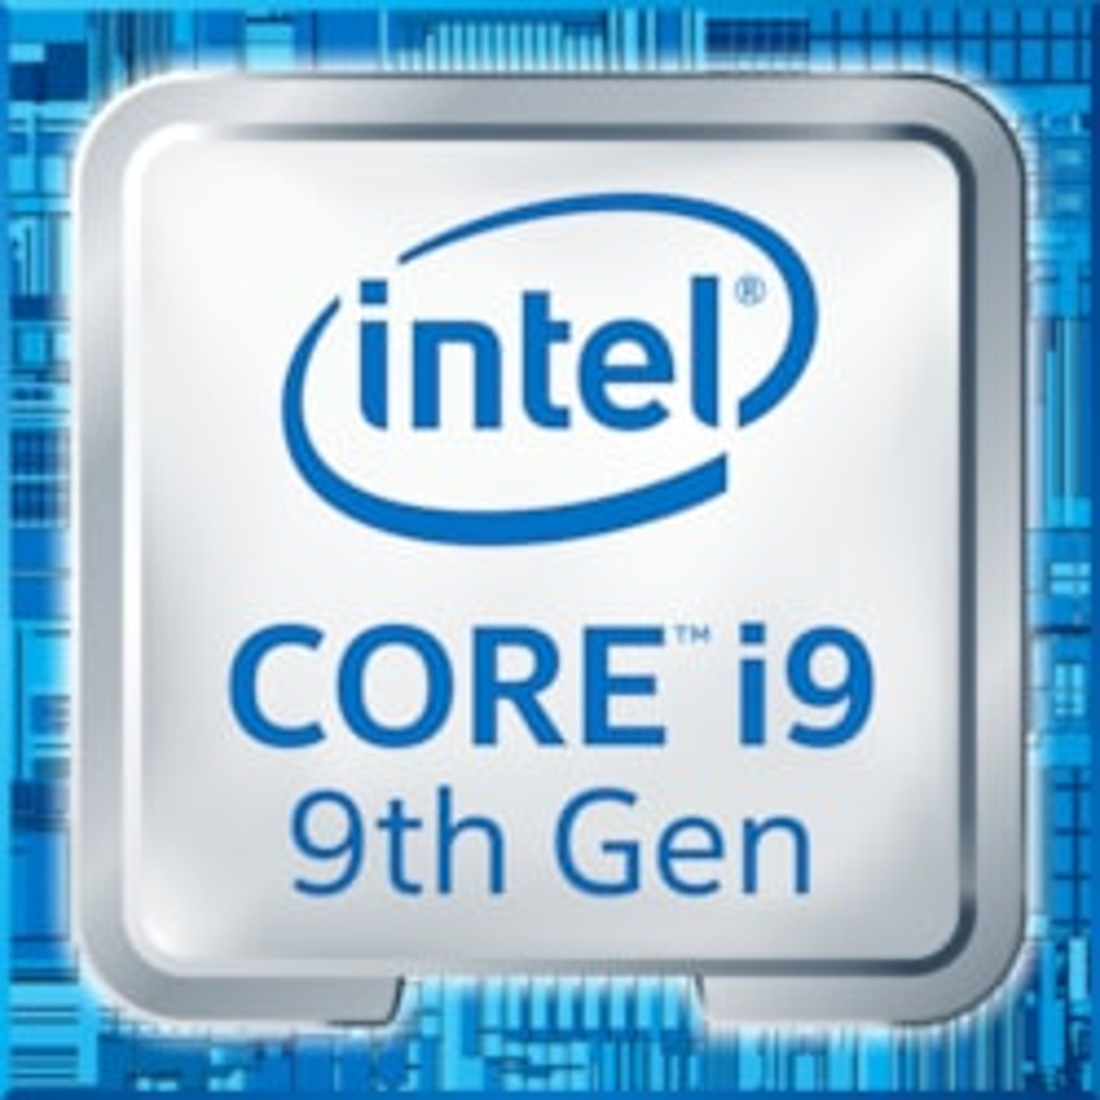 Intel Core i9 (9th Gen) i9-9900 Octa-core (8 Core) 3.10 GHz Processor - Retail Pack